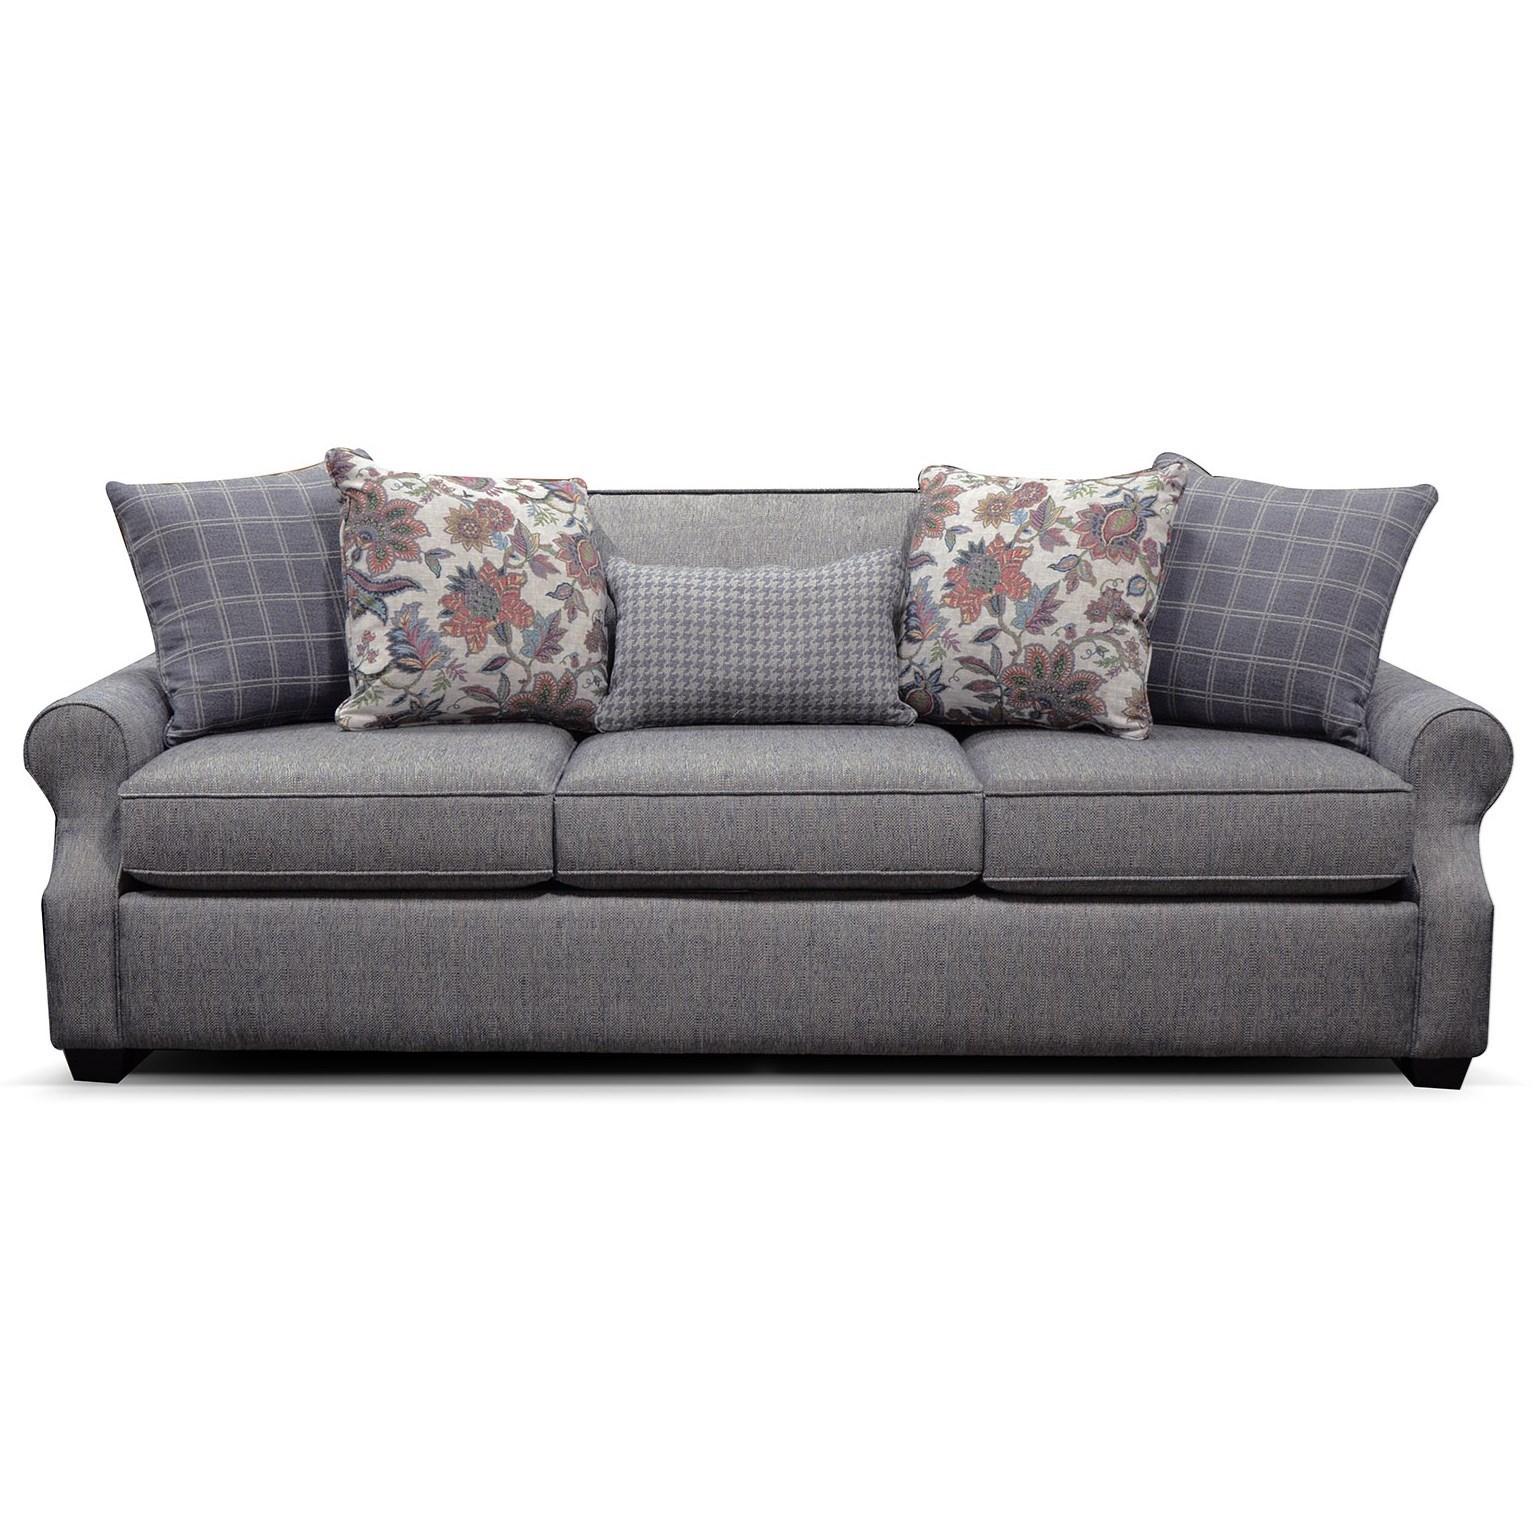 England Adele Sofa Dunk Bright Furniture Sofas